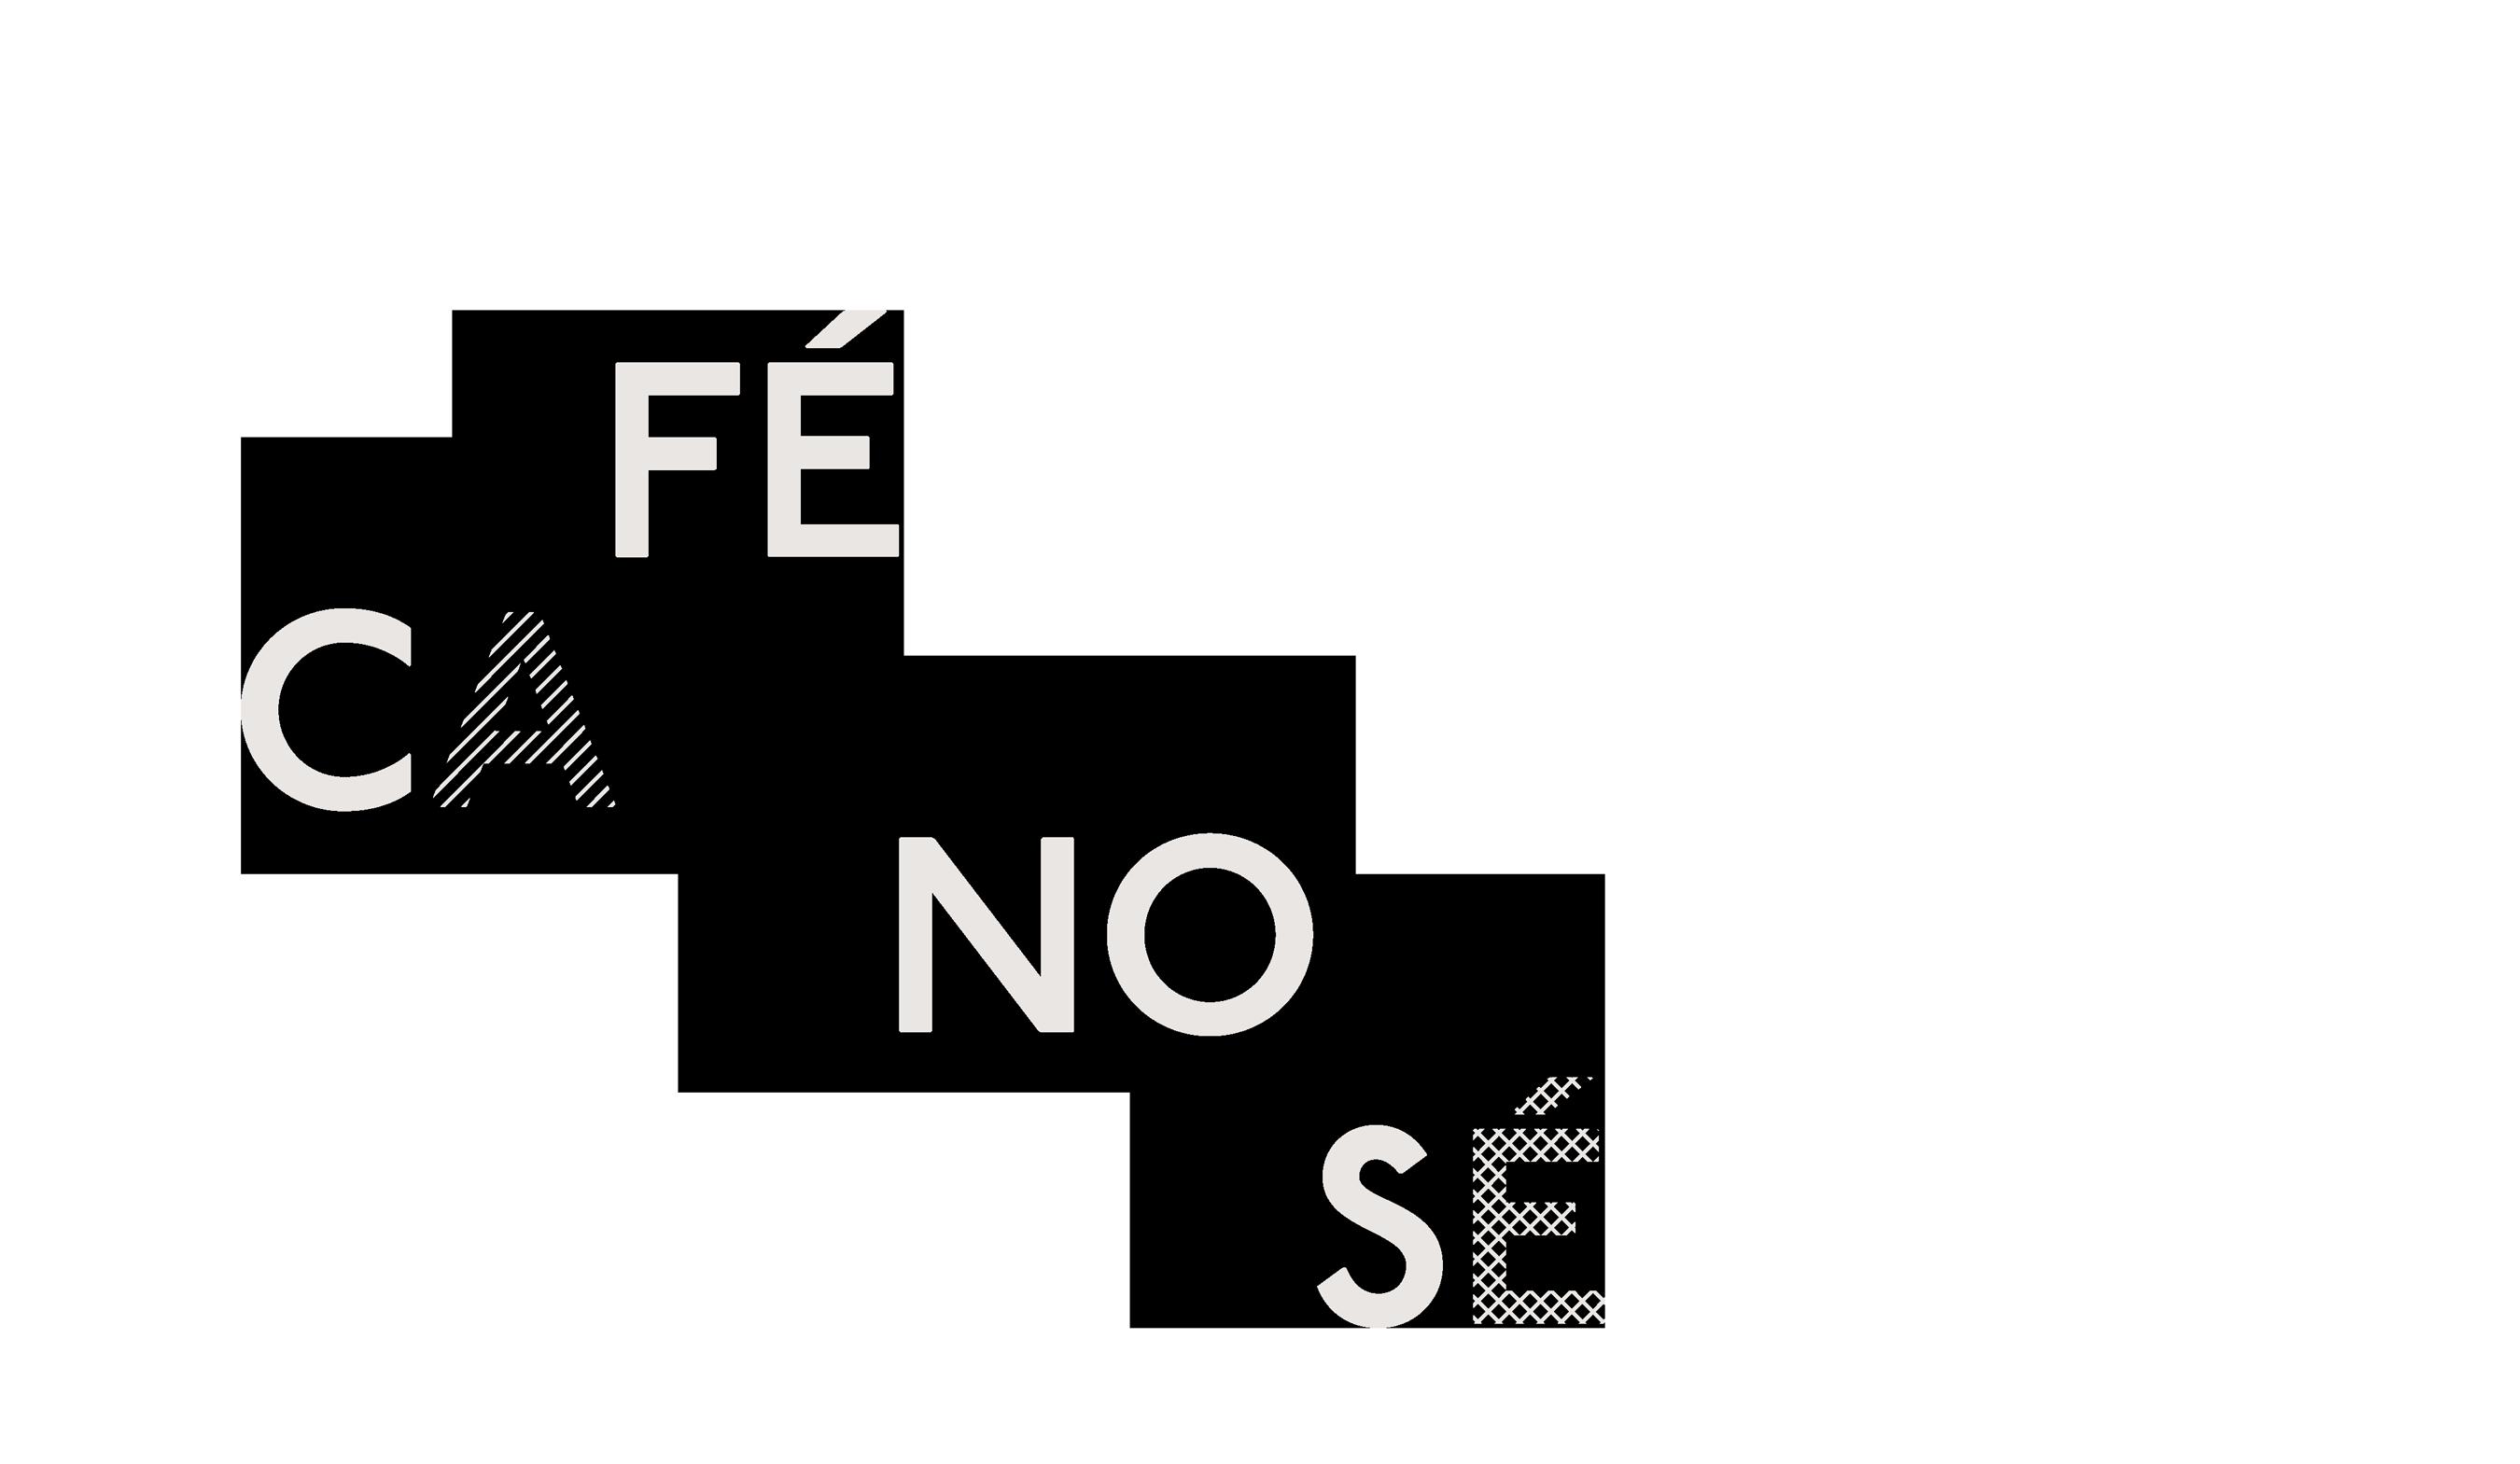 cafenose-square-logo.png